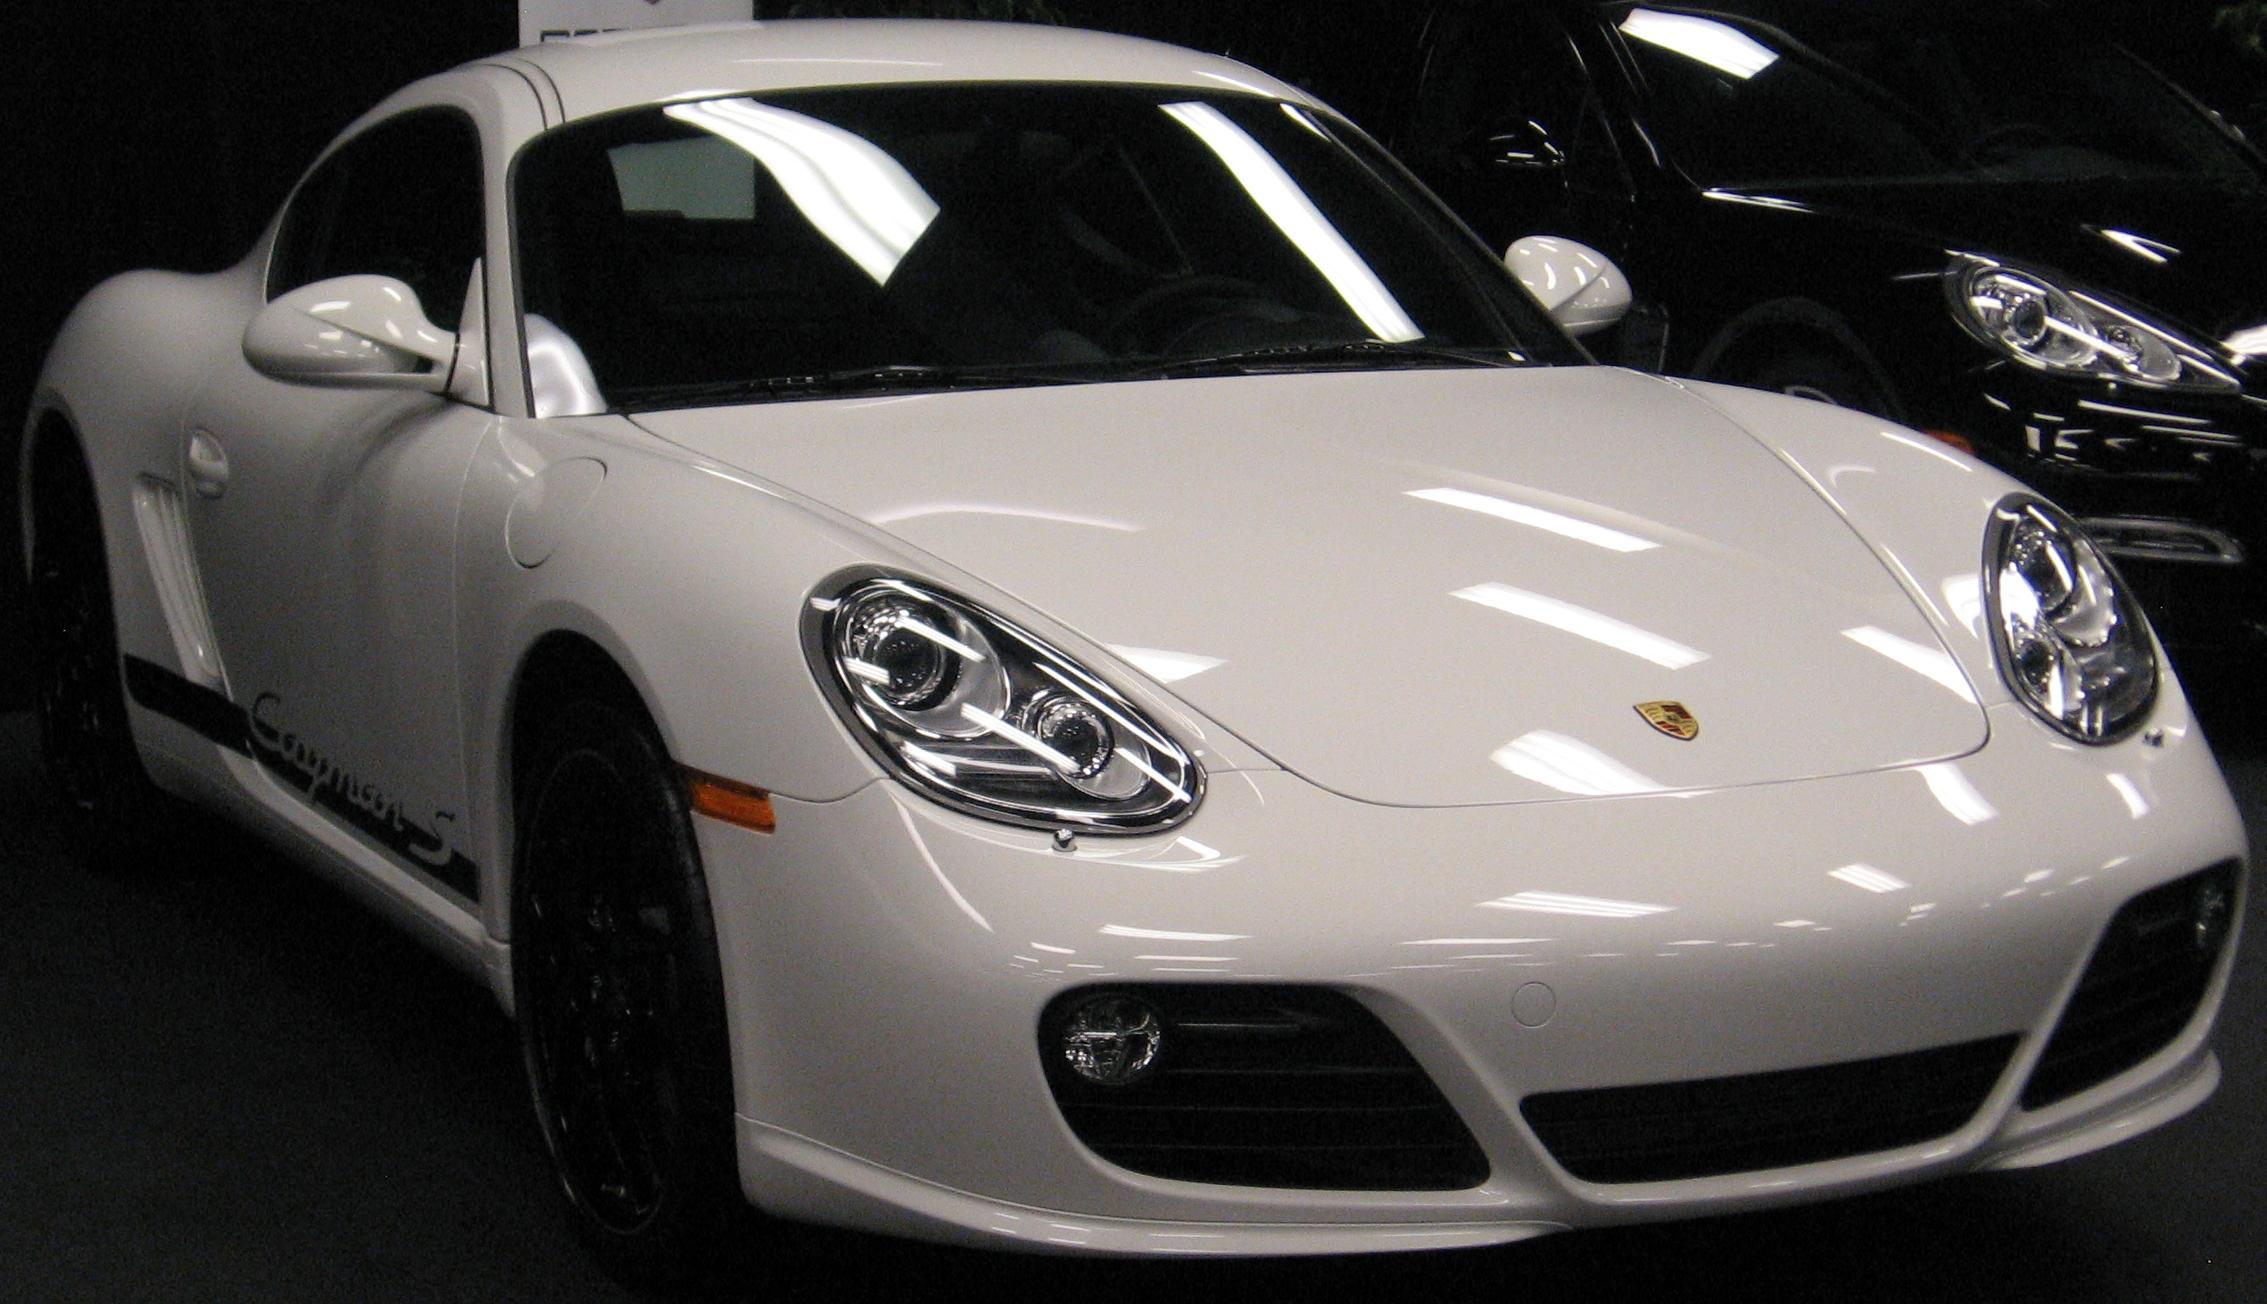 File11 Porsche Cayman S Mias 11jpg Wikimedia Commons